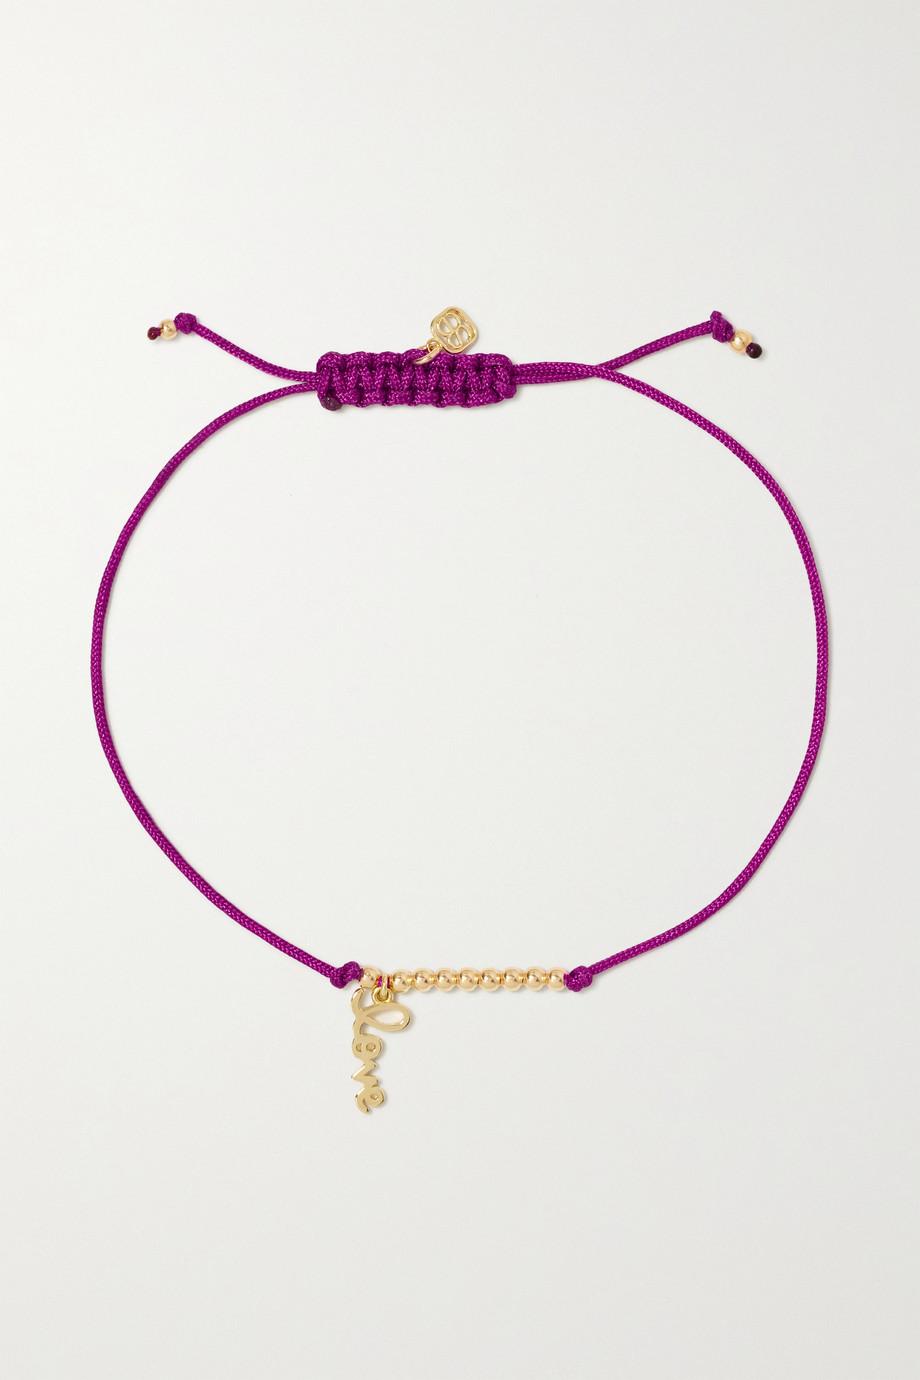 Sydney Evan Pure Love 14-karat gold cord bracelet